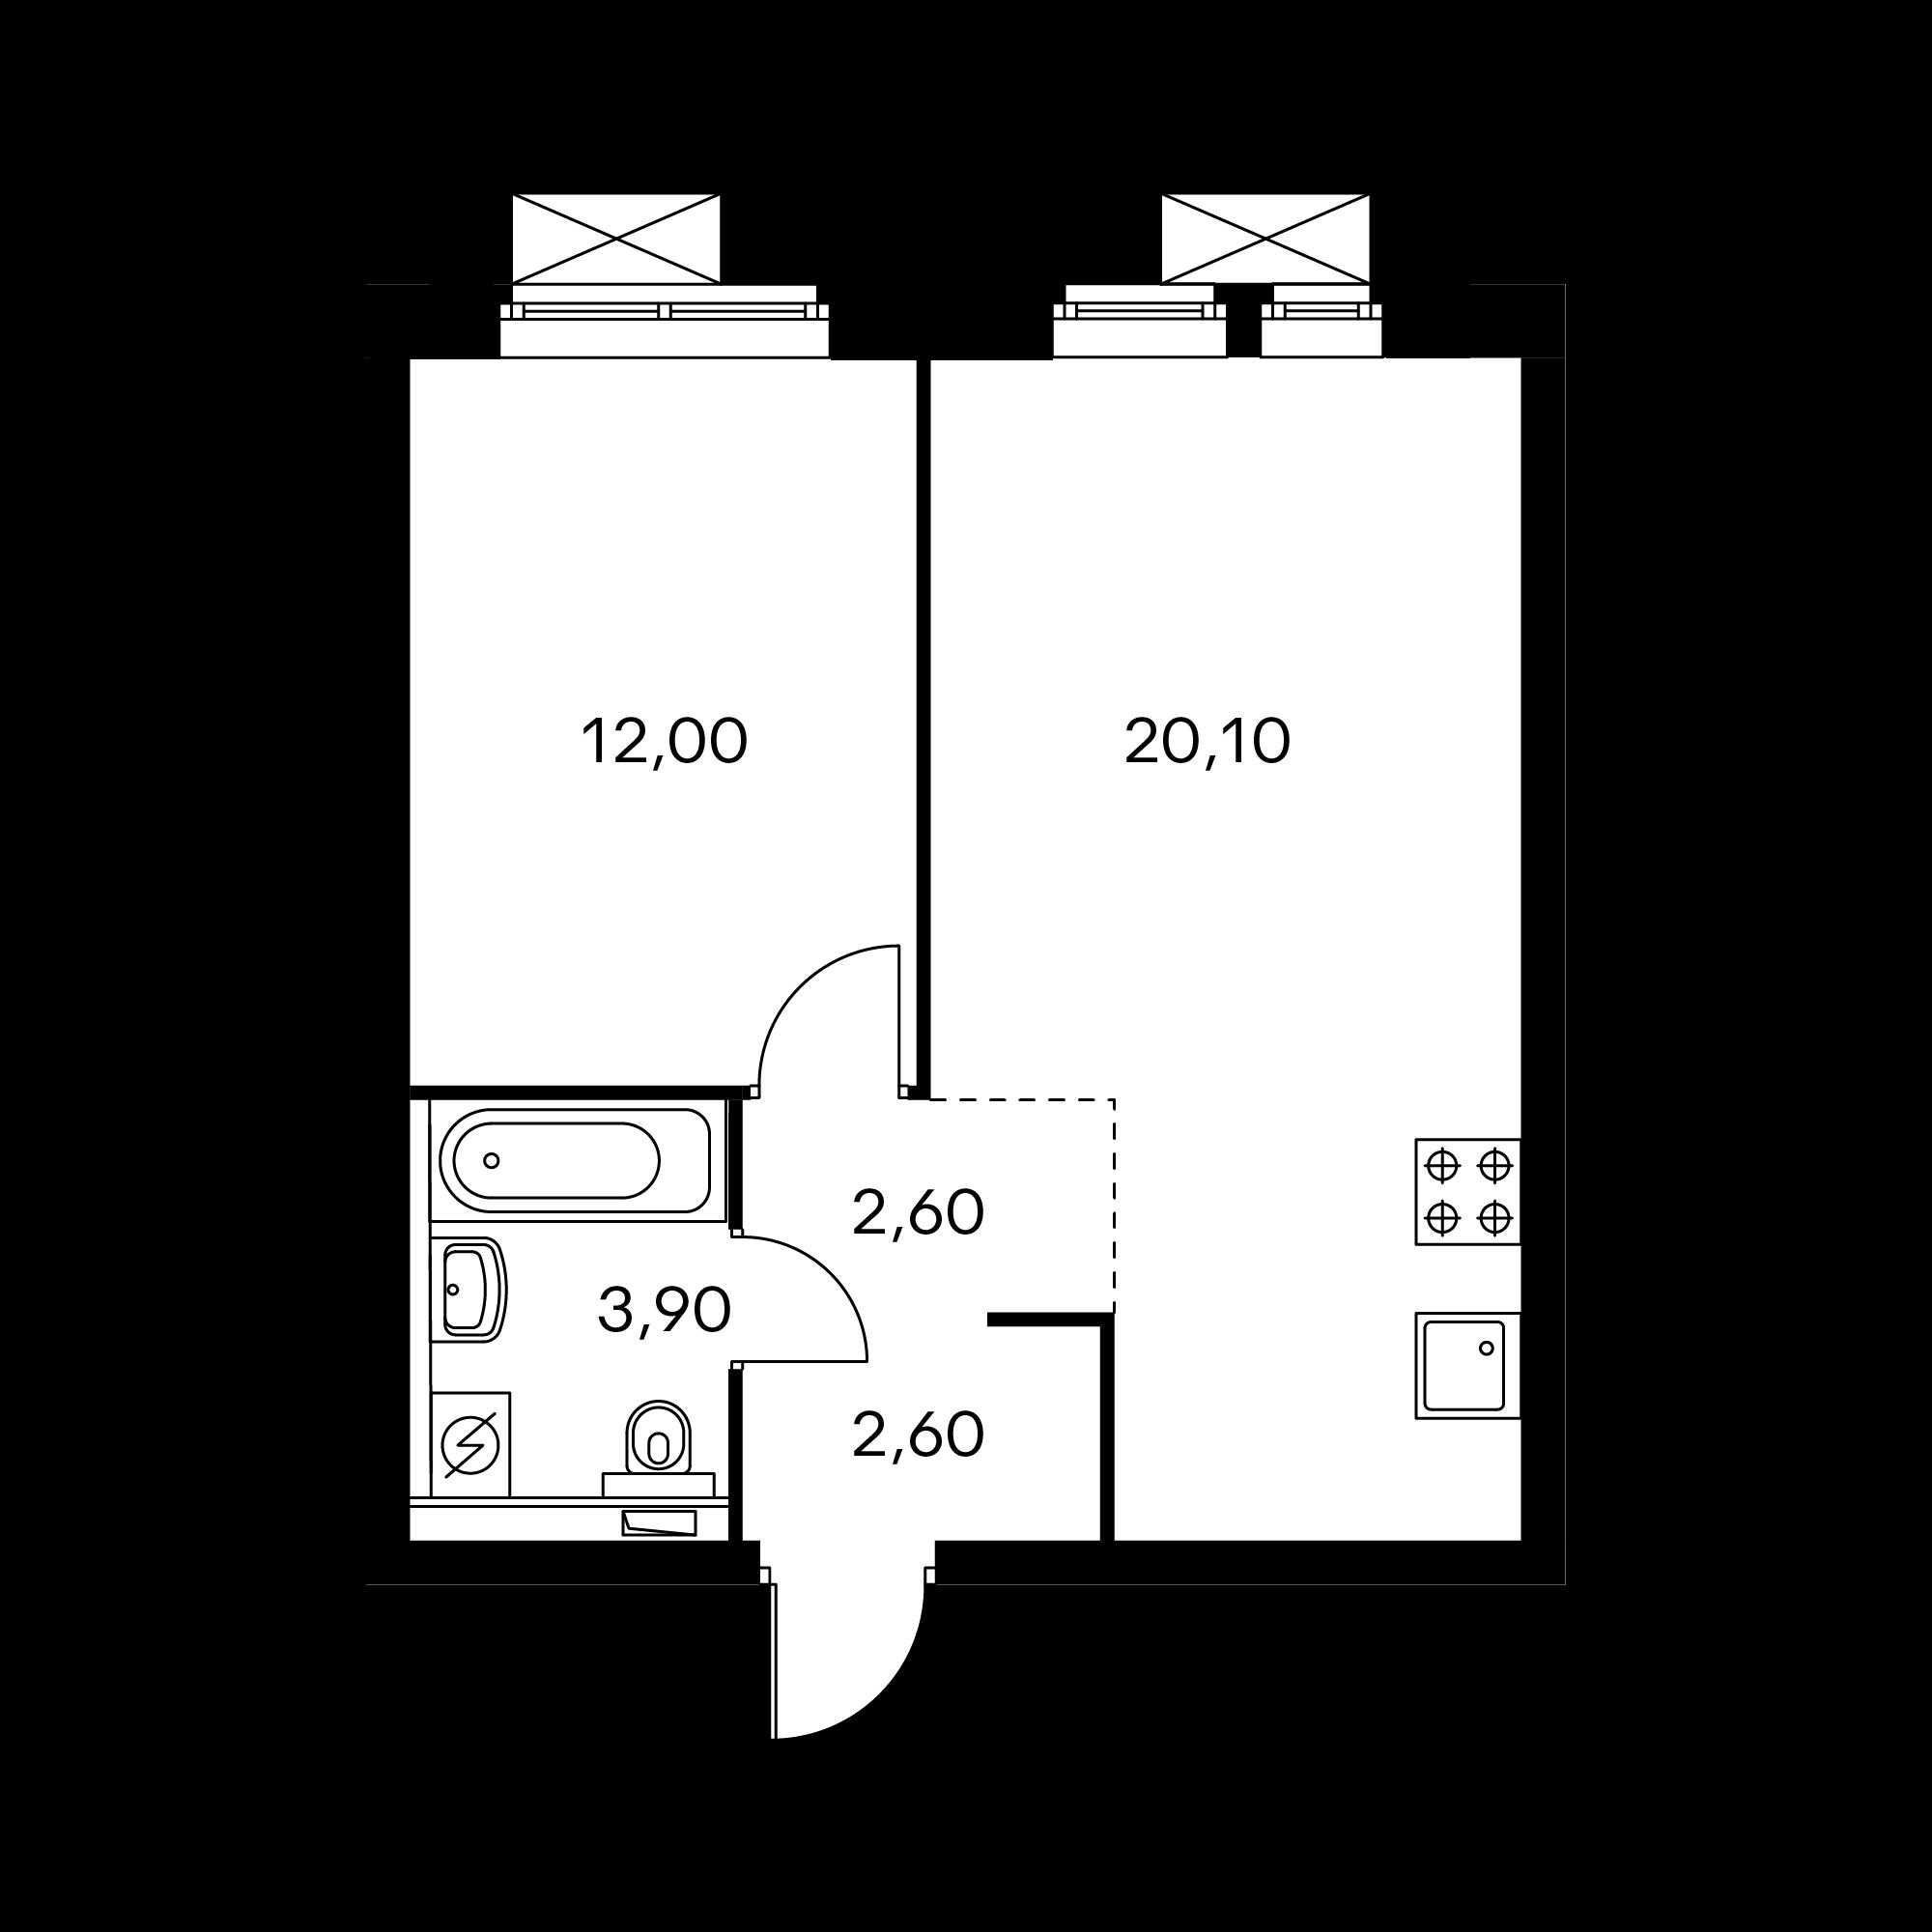 1EM1_6.6